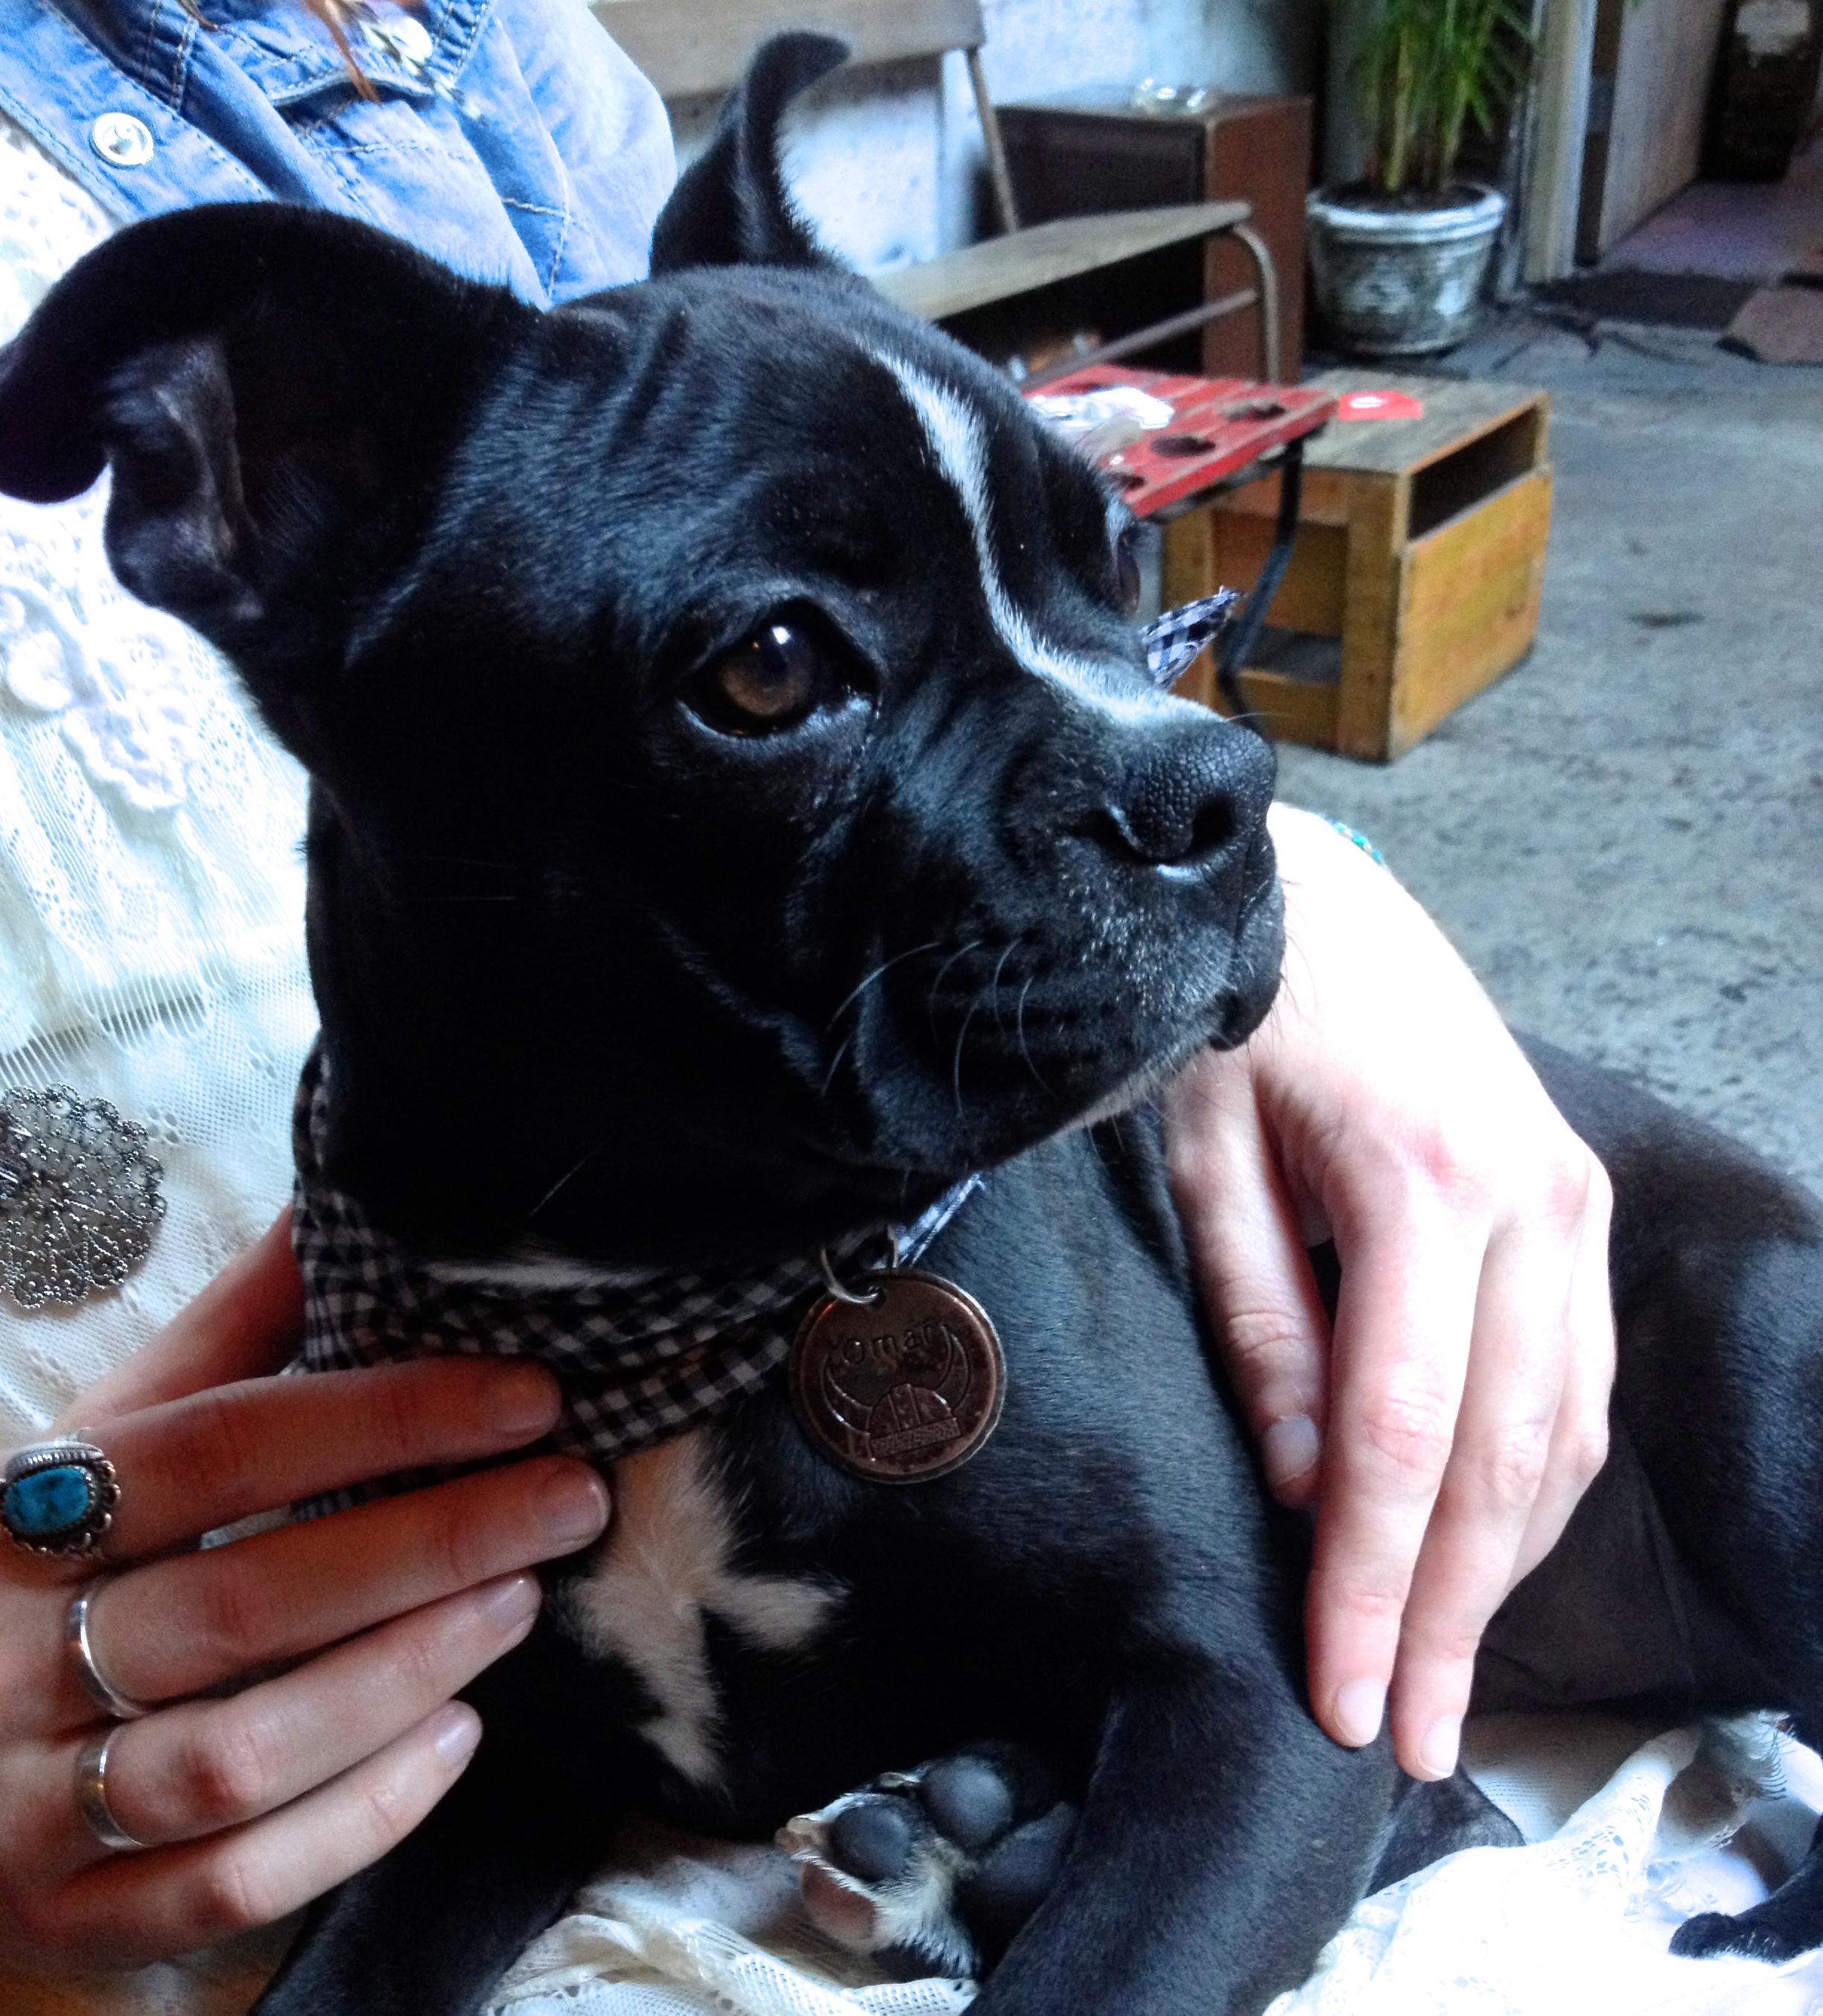 Cute Doggy - Arcadia Liquors in Redfern